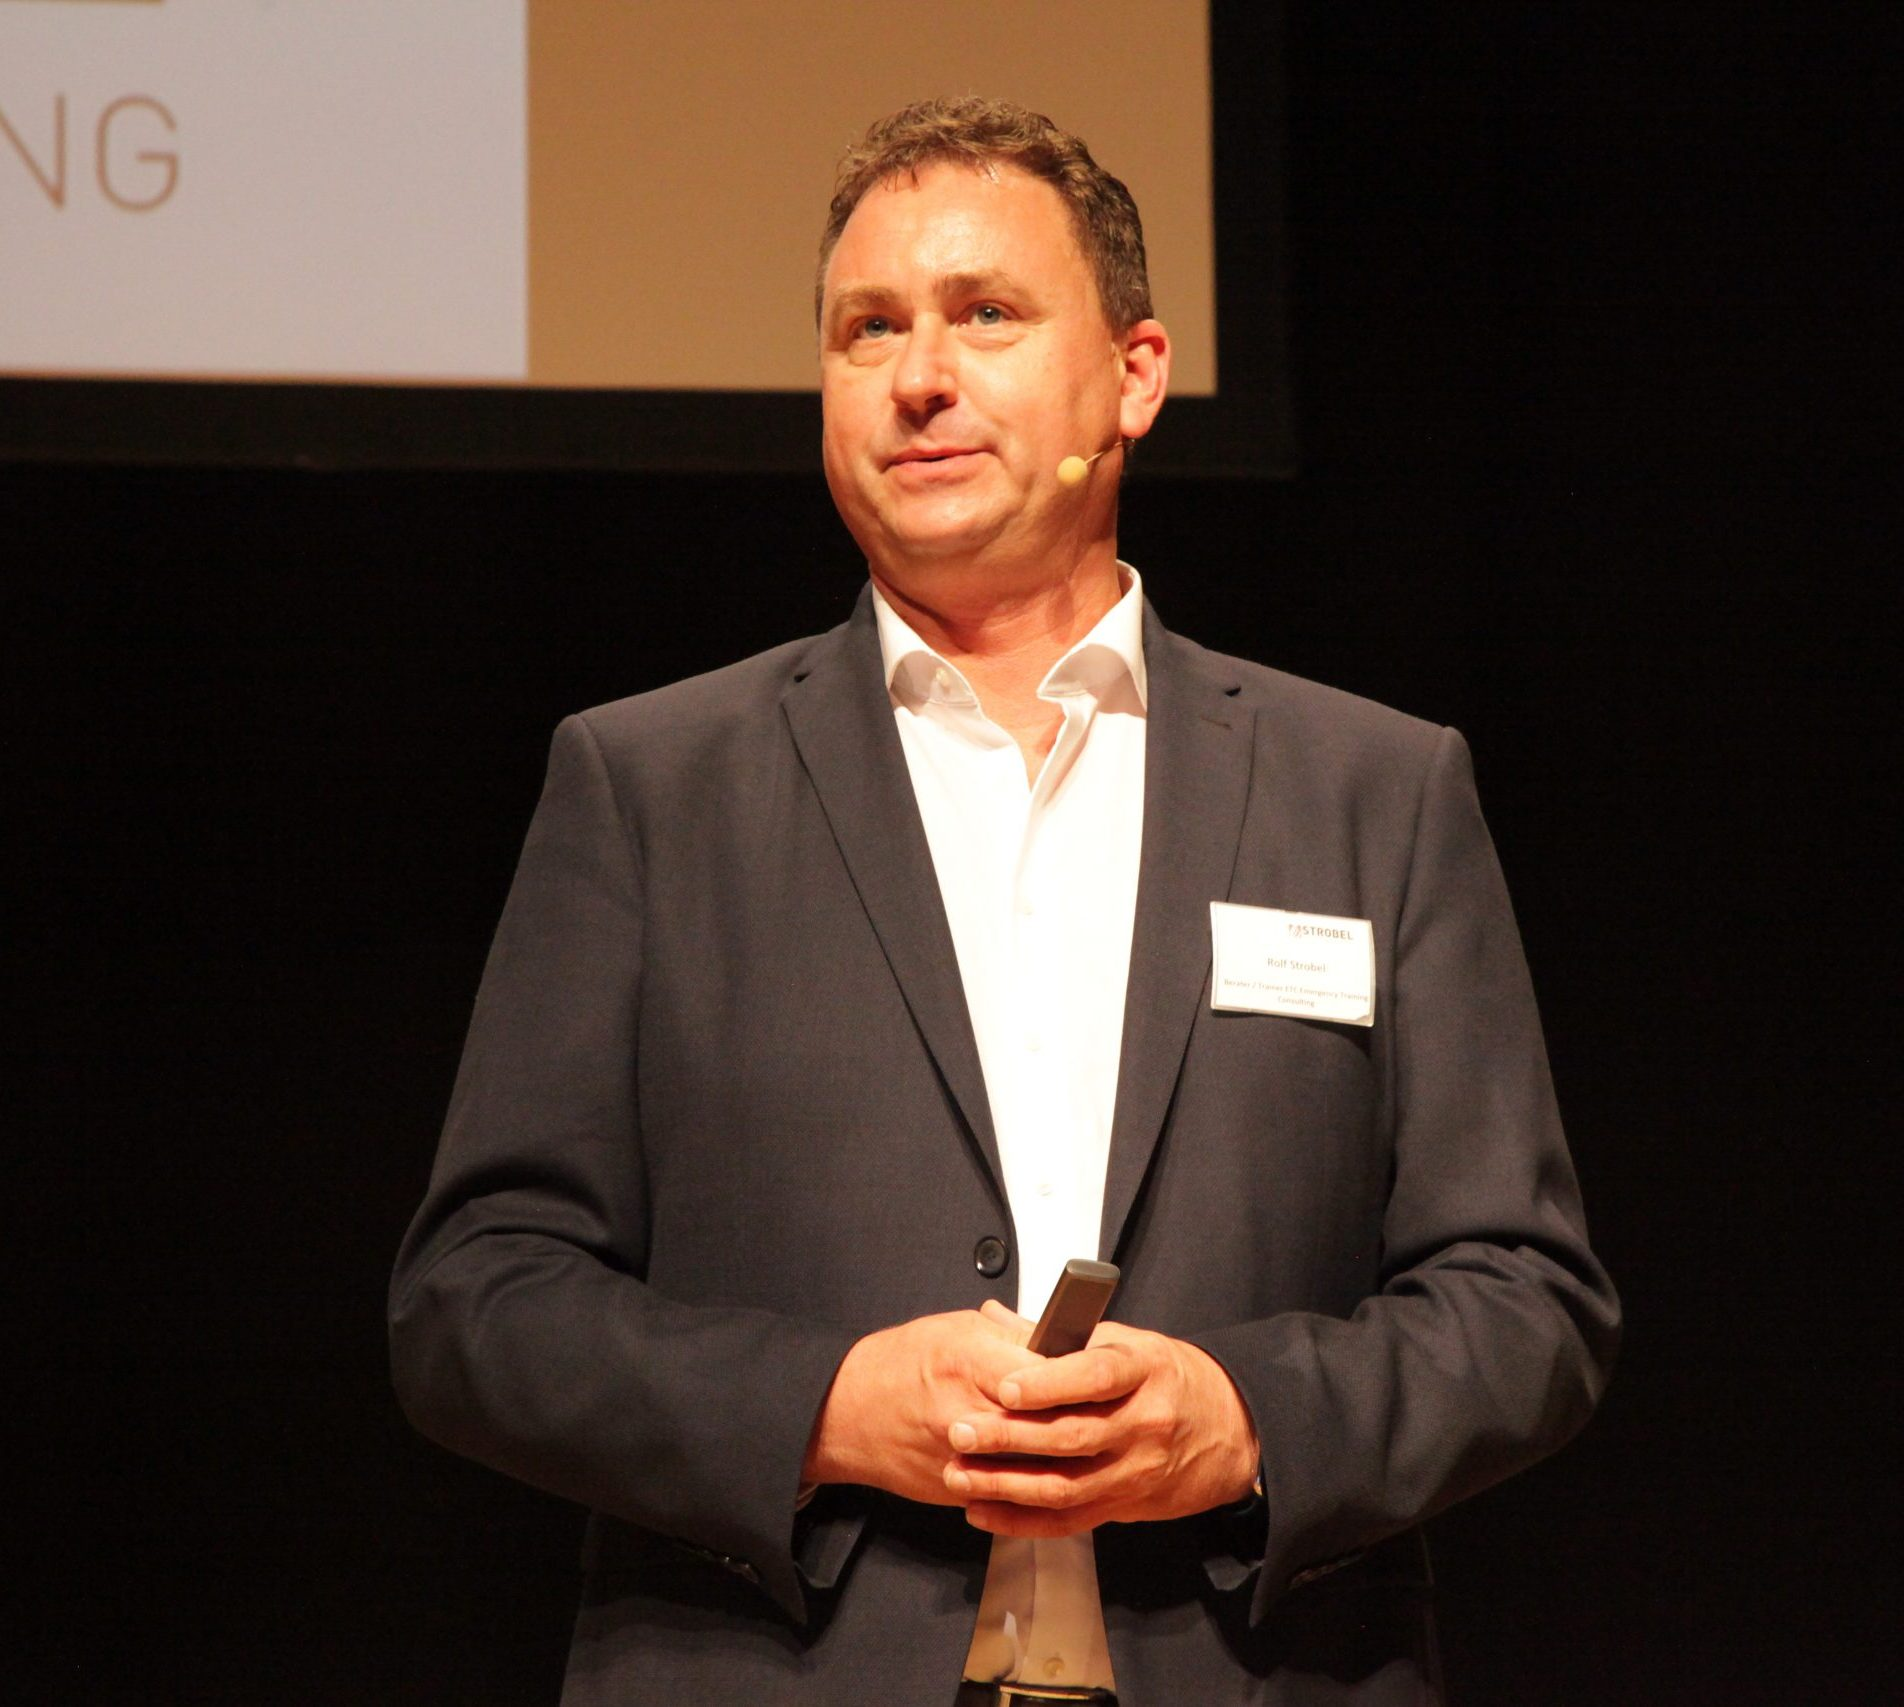 Rolf Strobel